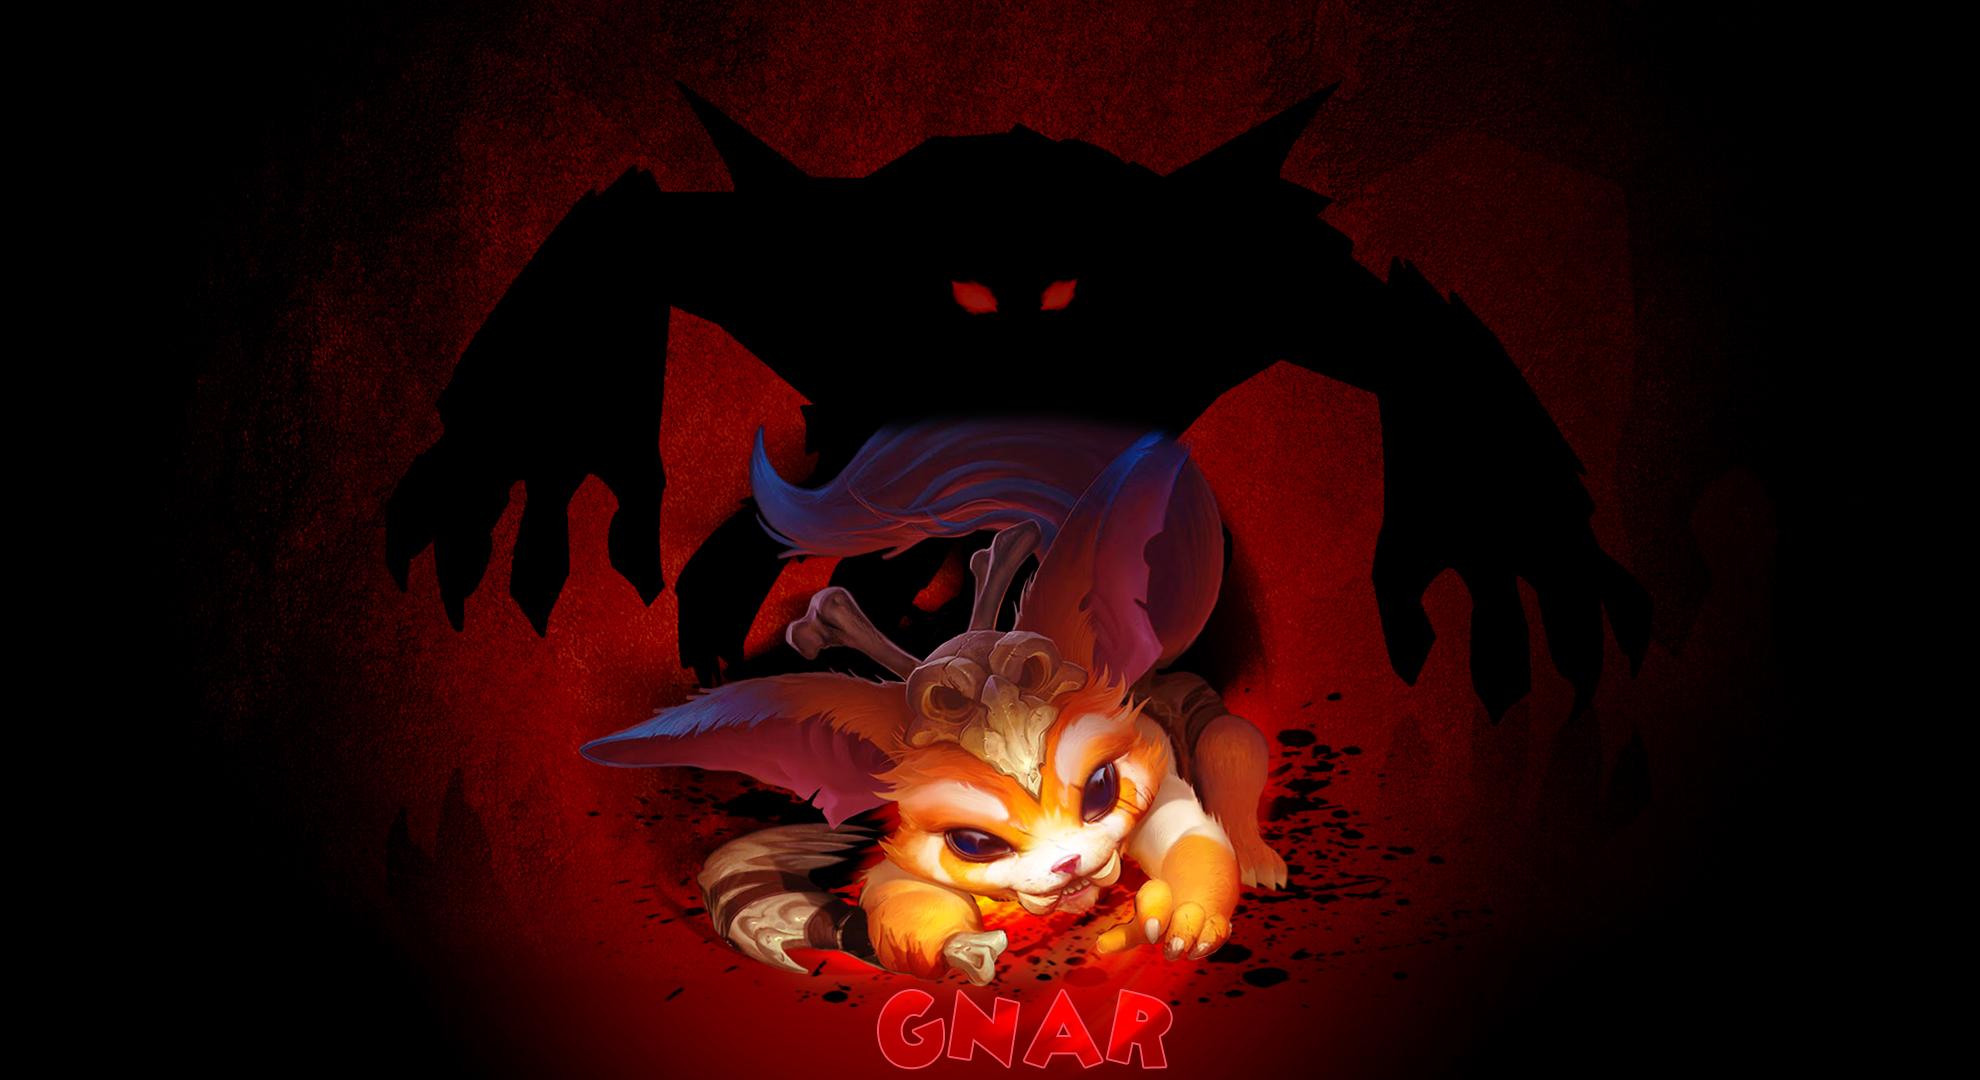 Gnar The Missing Link Wallpaper By Darkuneplays On Deviantart